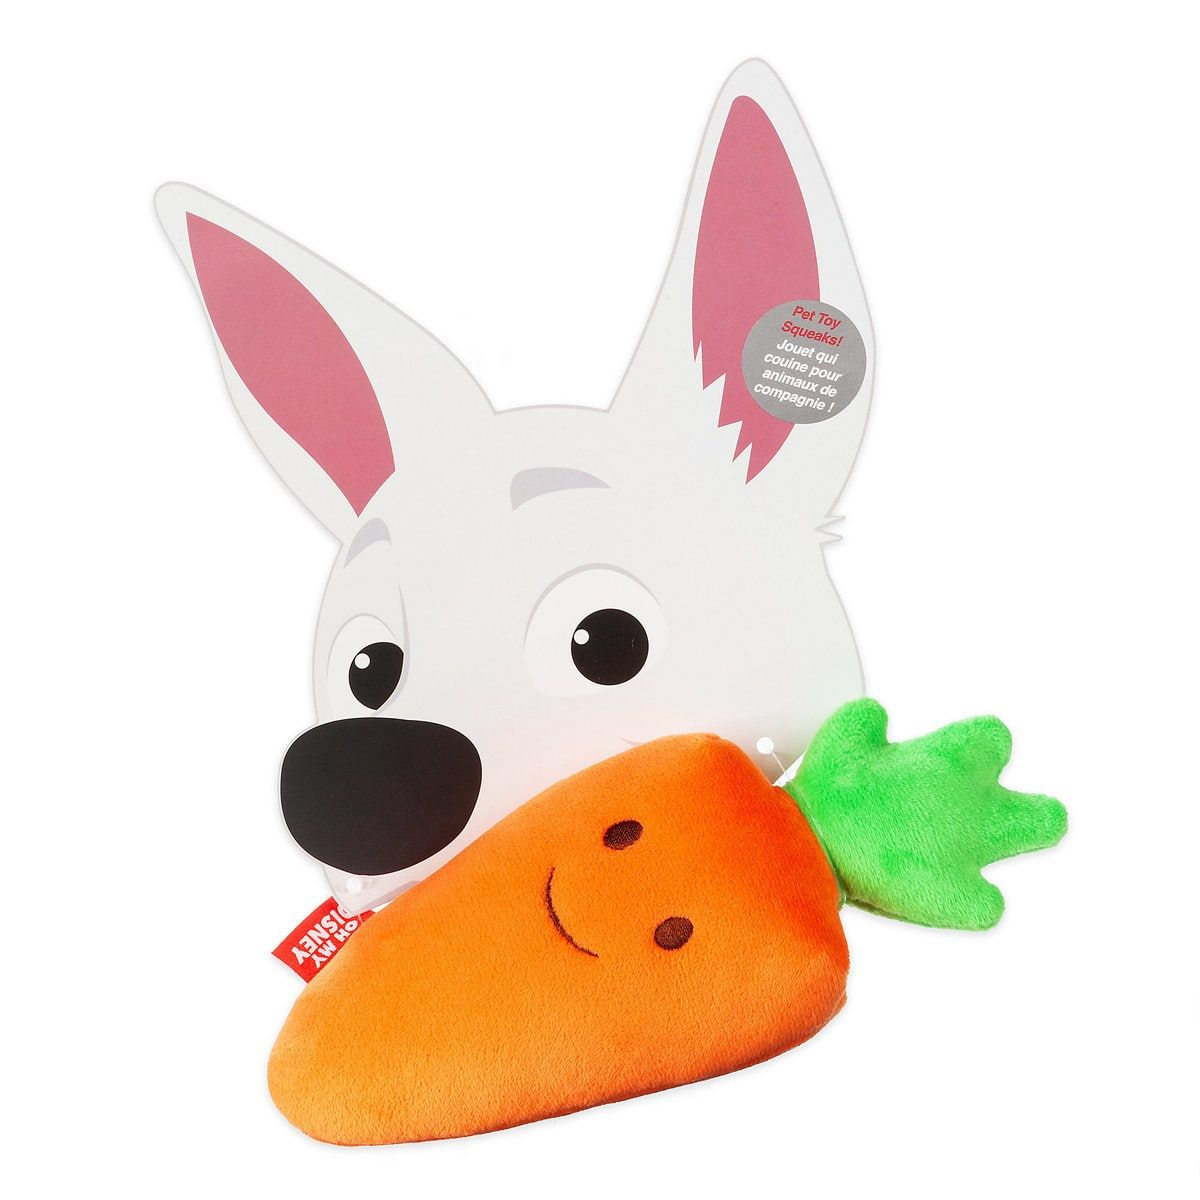 Bolt Mr Carrot Chew Toy Oh My Disney Chew Toy Bolt Dog